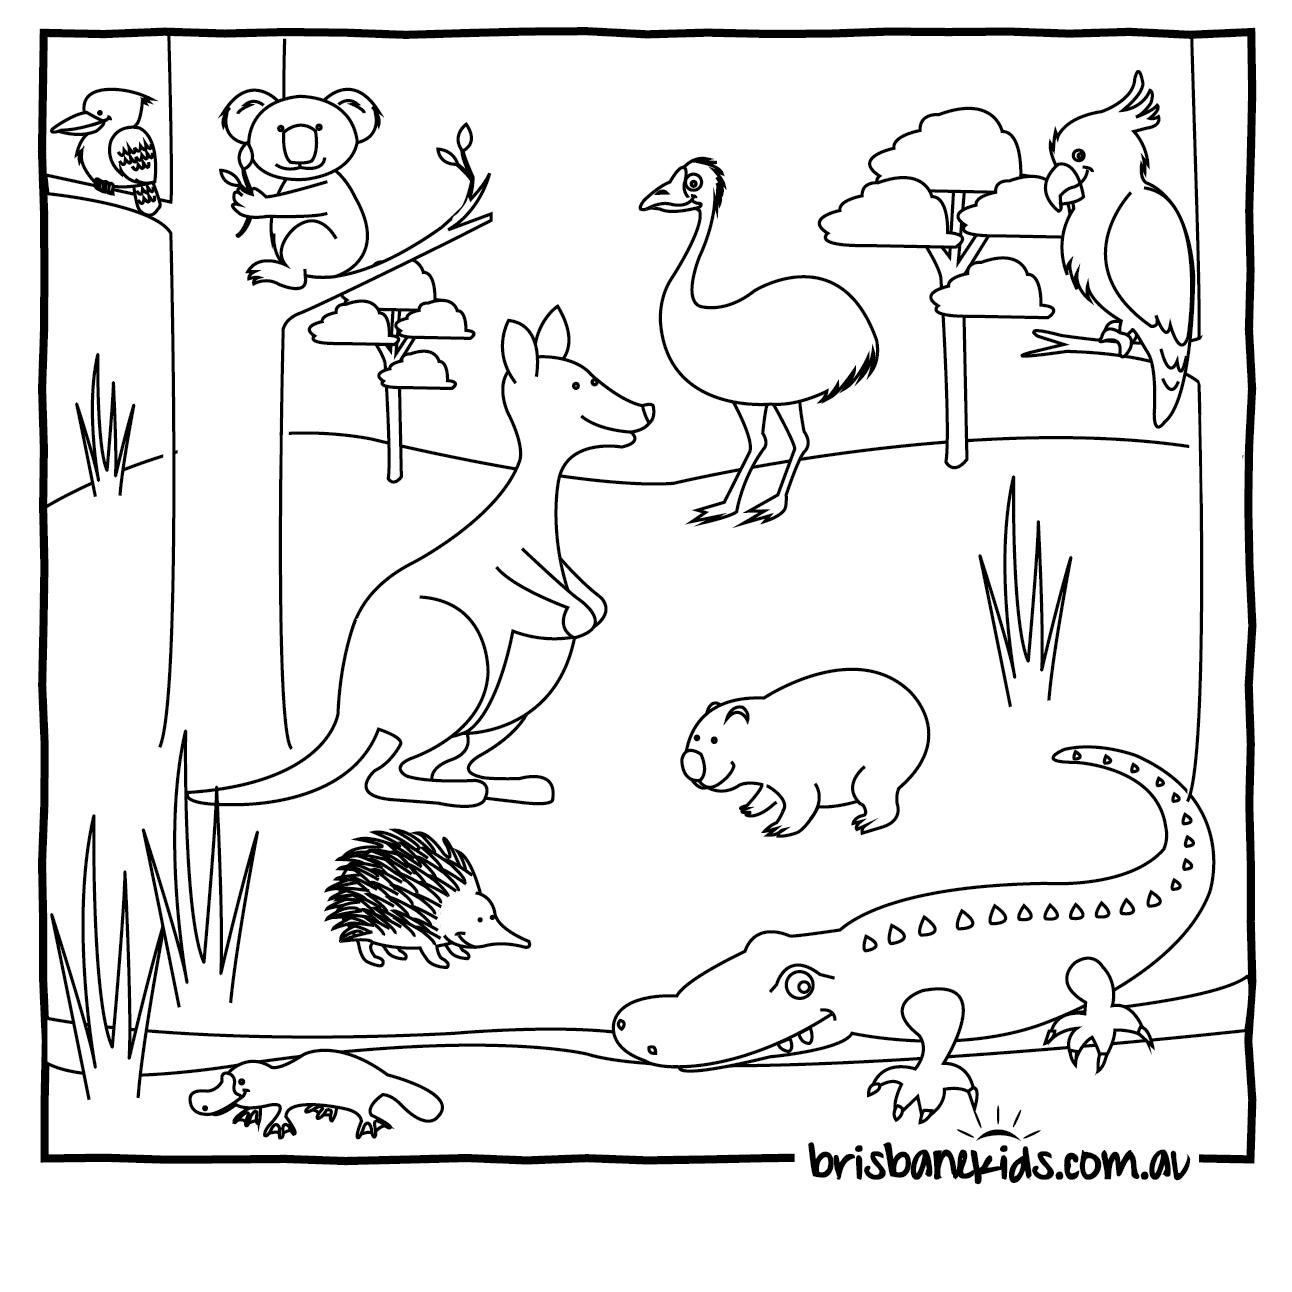 Australian Animals Colouring Pages | Brisbane Kids - Free Printable Australian Animals